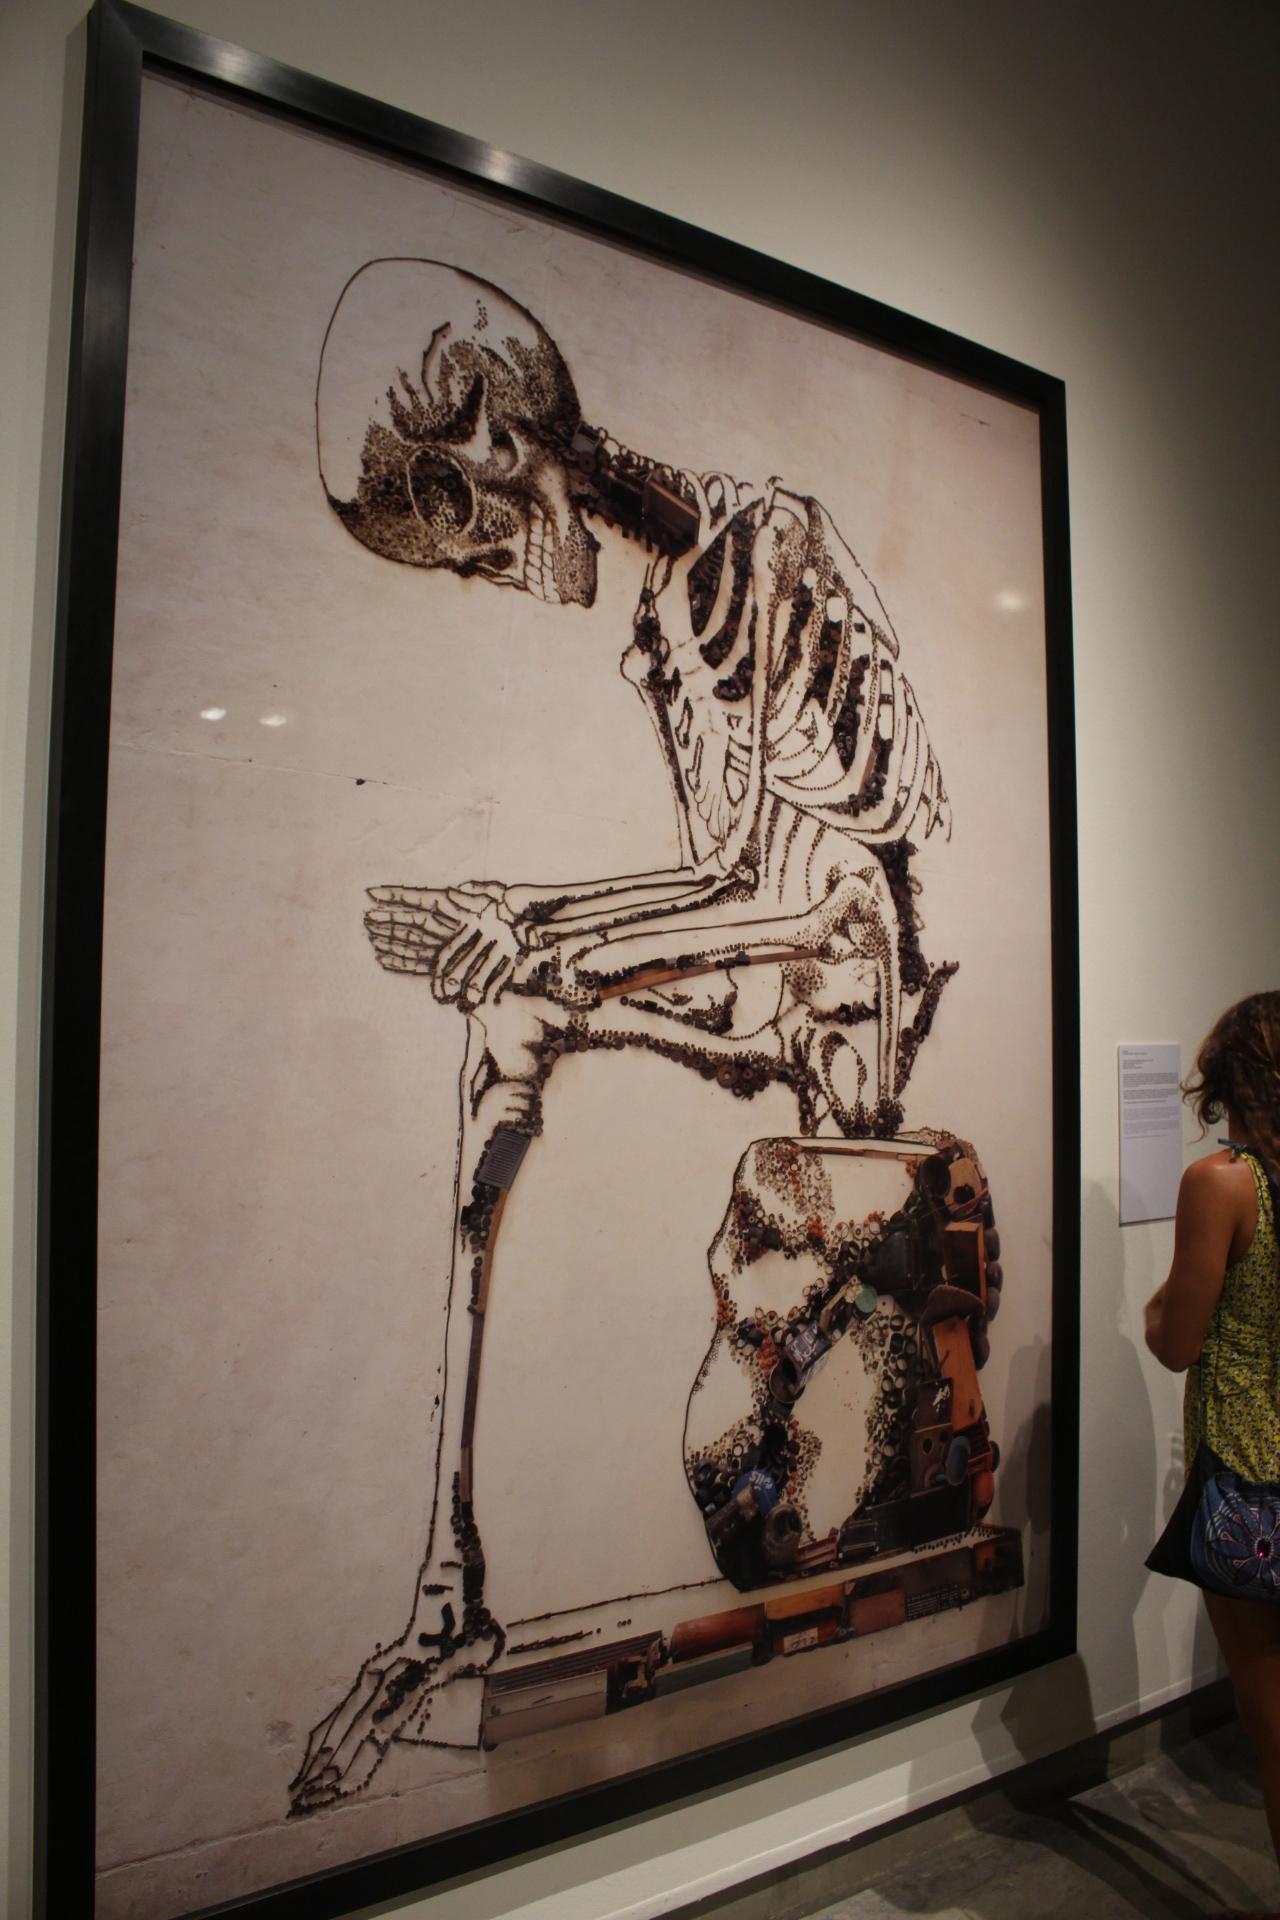 Anatomy, After Francesco Bertinatti (pictures of Junk), 2009. Vik Muniz. Impresión cromogénica digital, Ed 5/6. Colección privada.